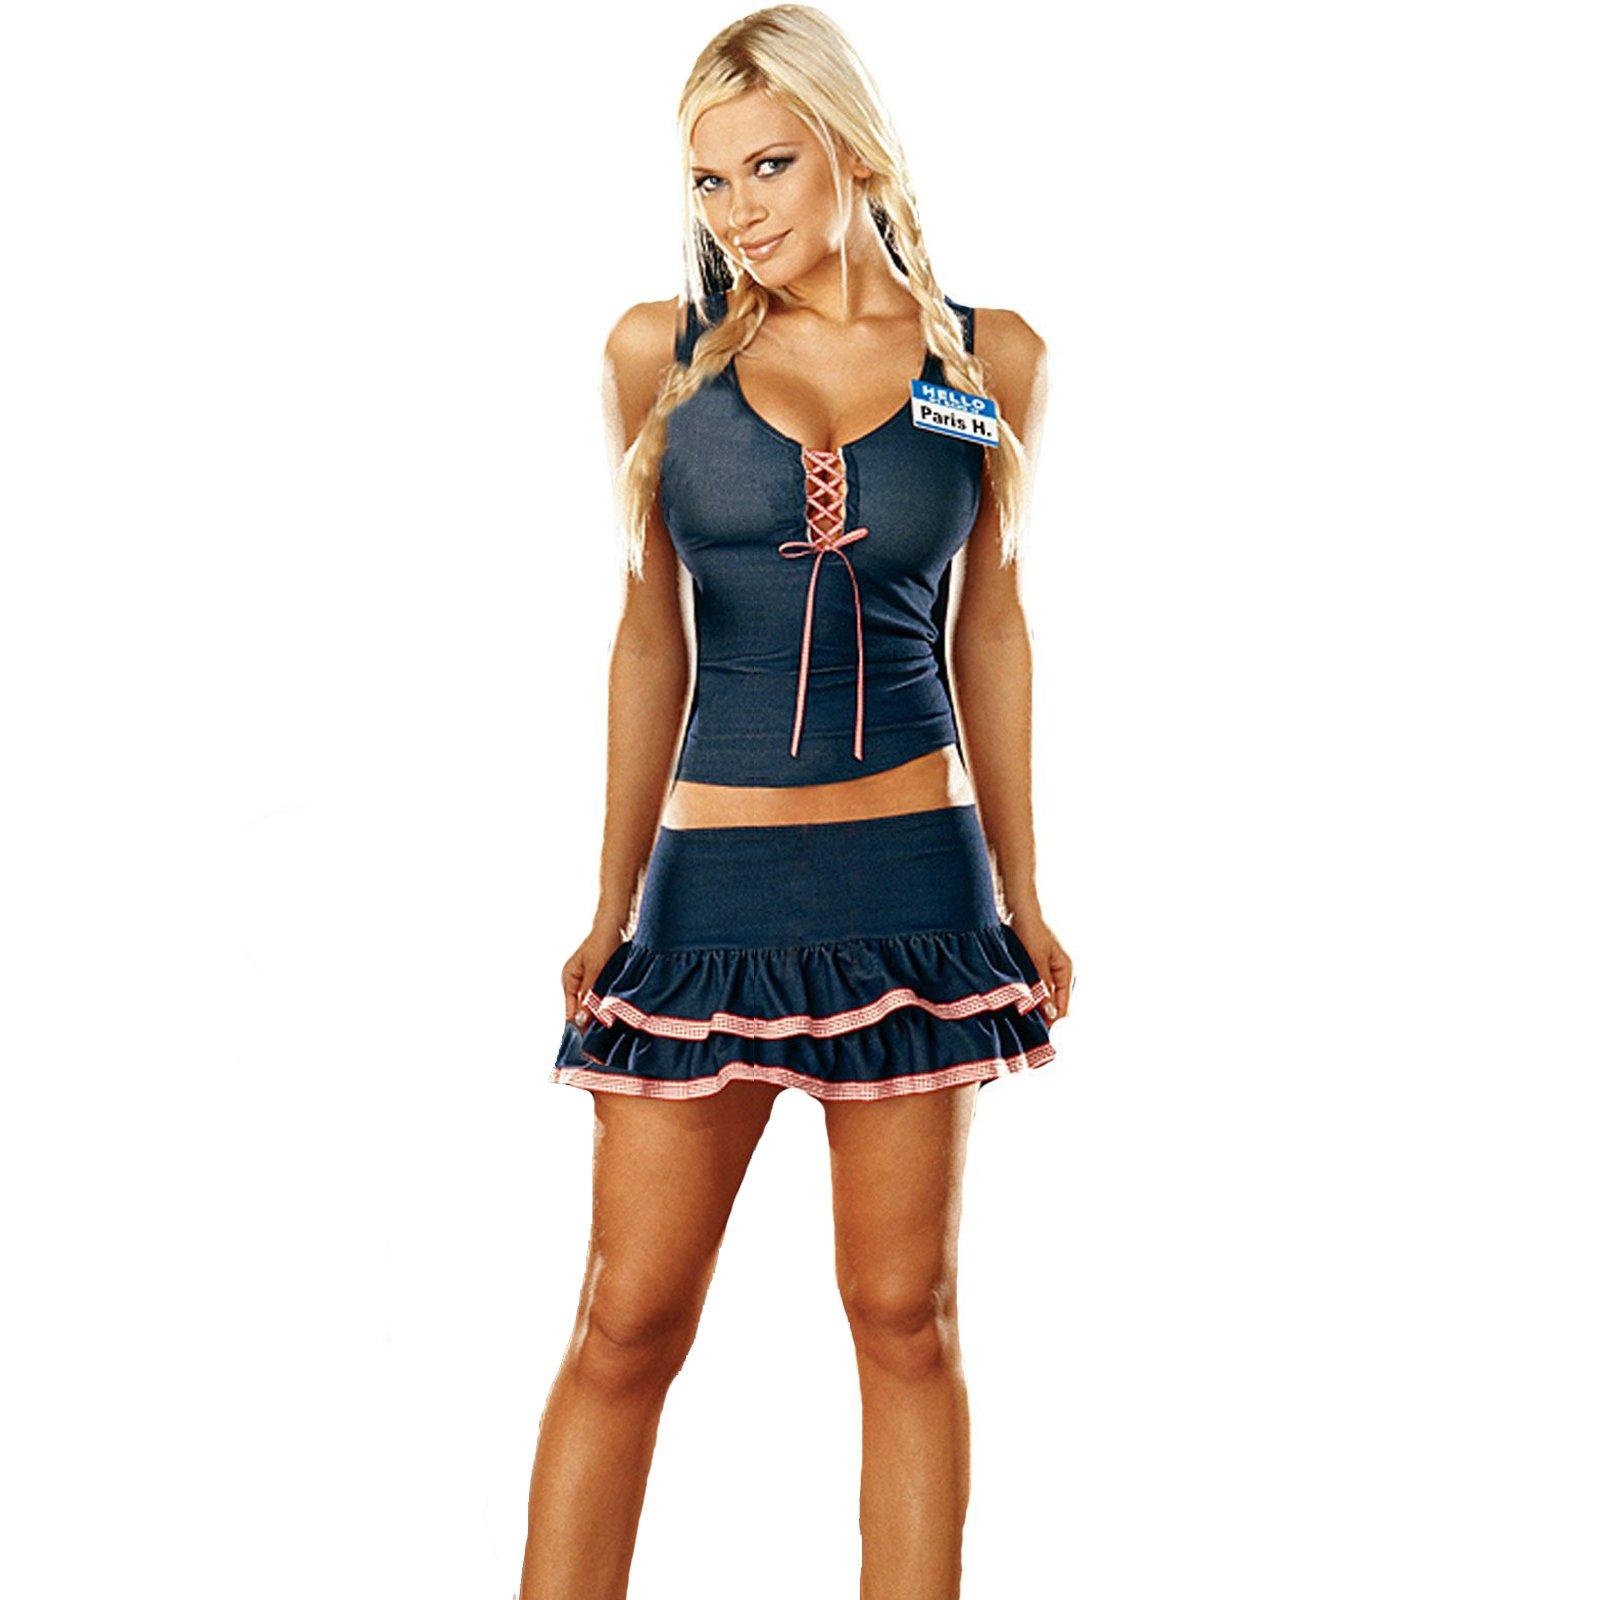 eeyore Adult halloween costume